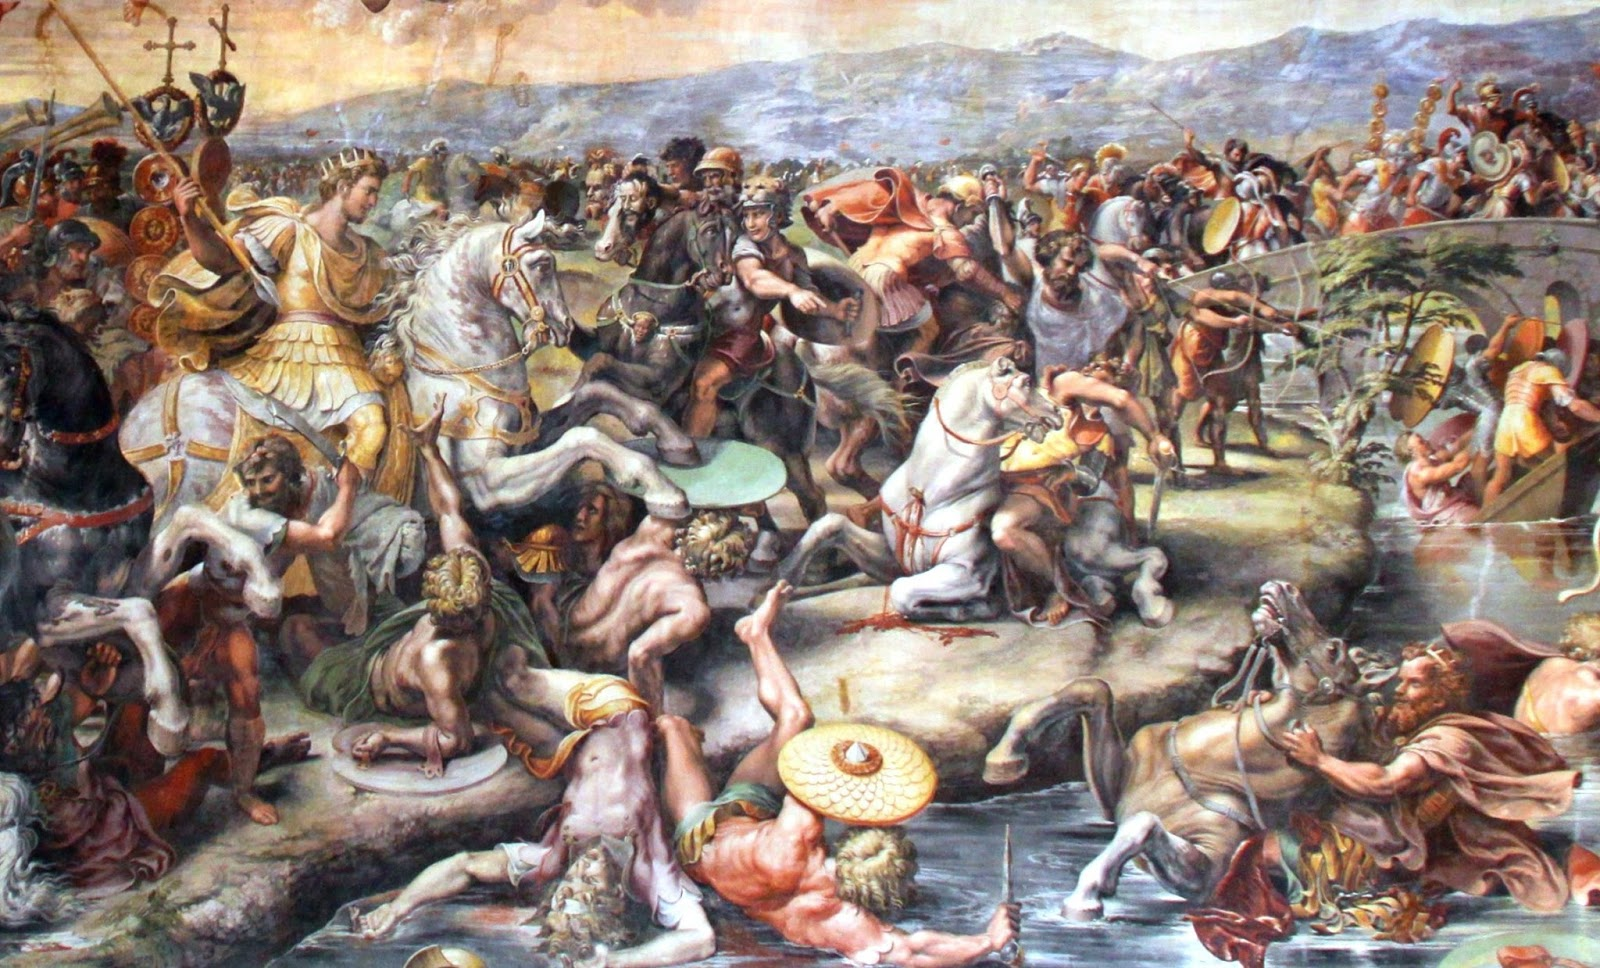 Battle_of_the_Milvian_Bridge_by_Giulio_Romano_1520-24